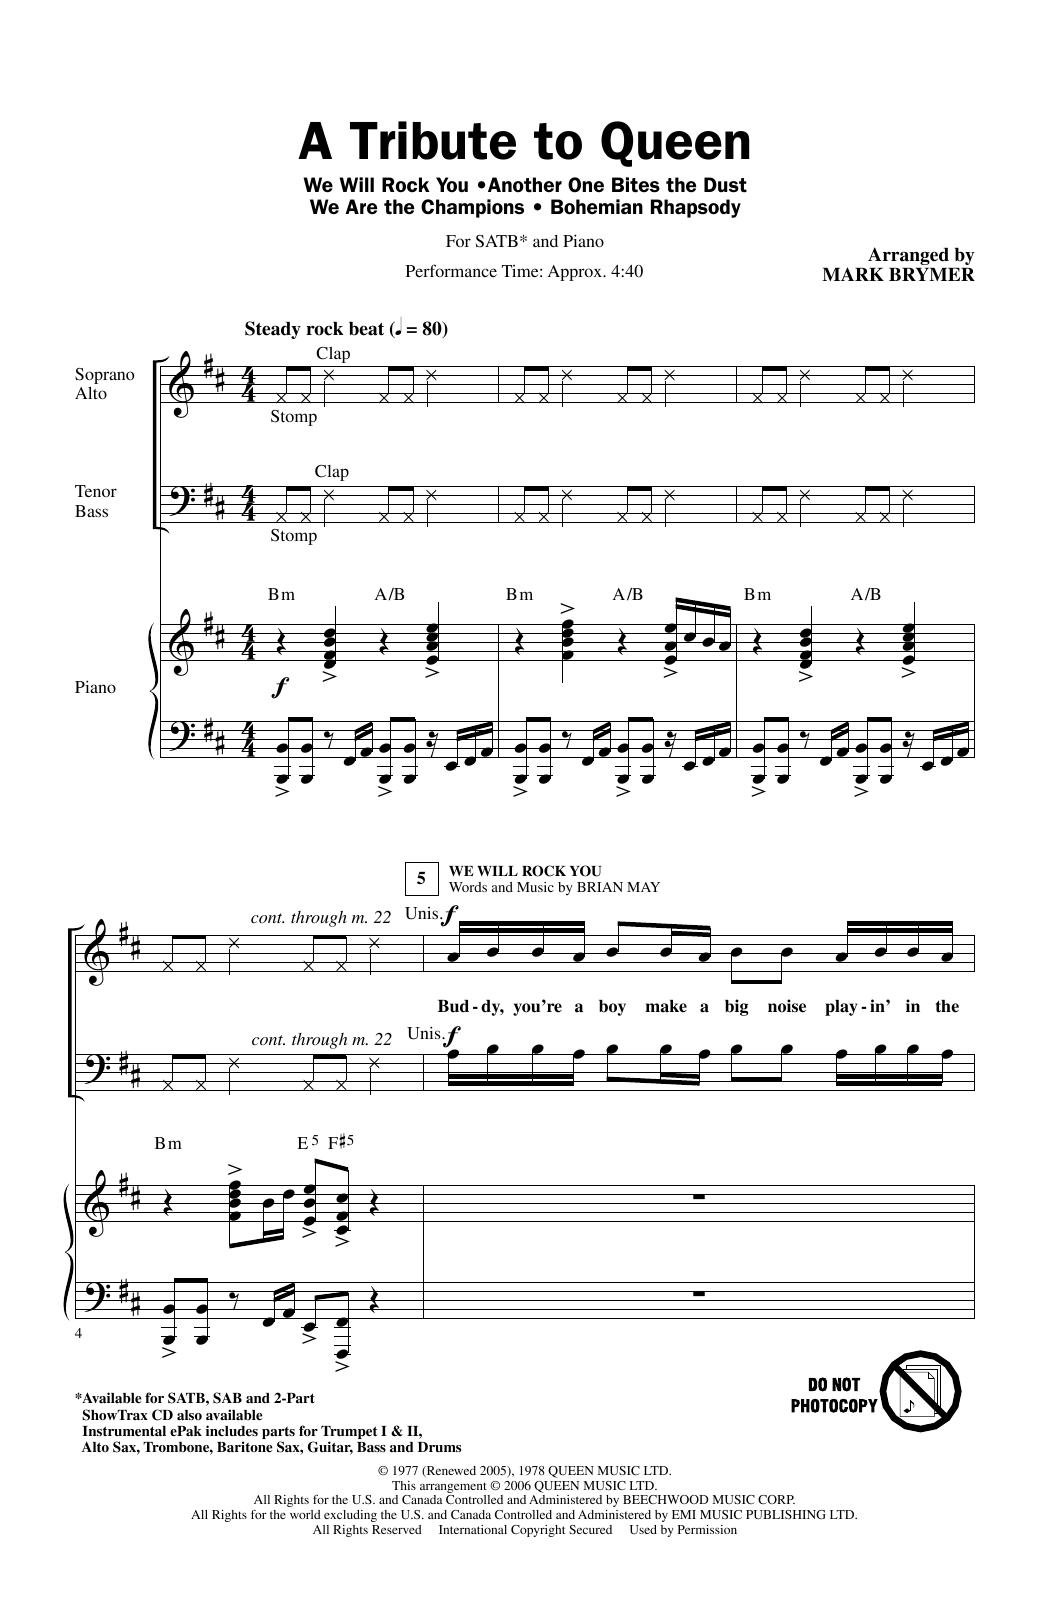 A Tribute To Queen (Medley) (arr. Mark Brymer) (SATB Choir)